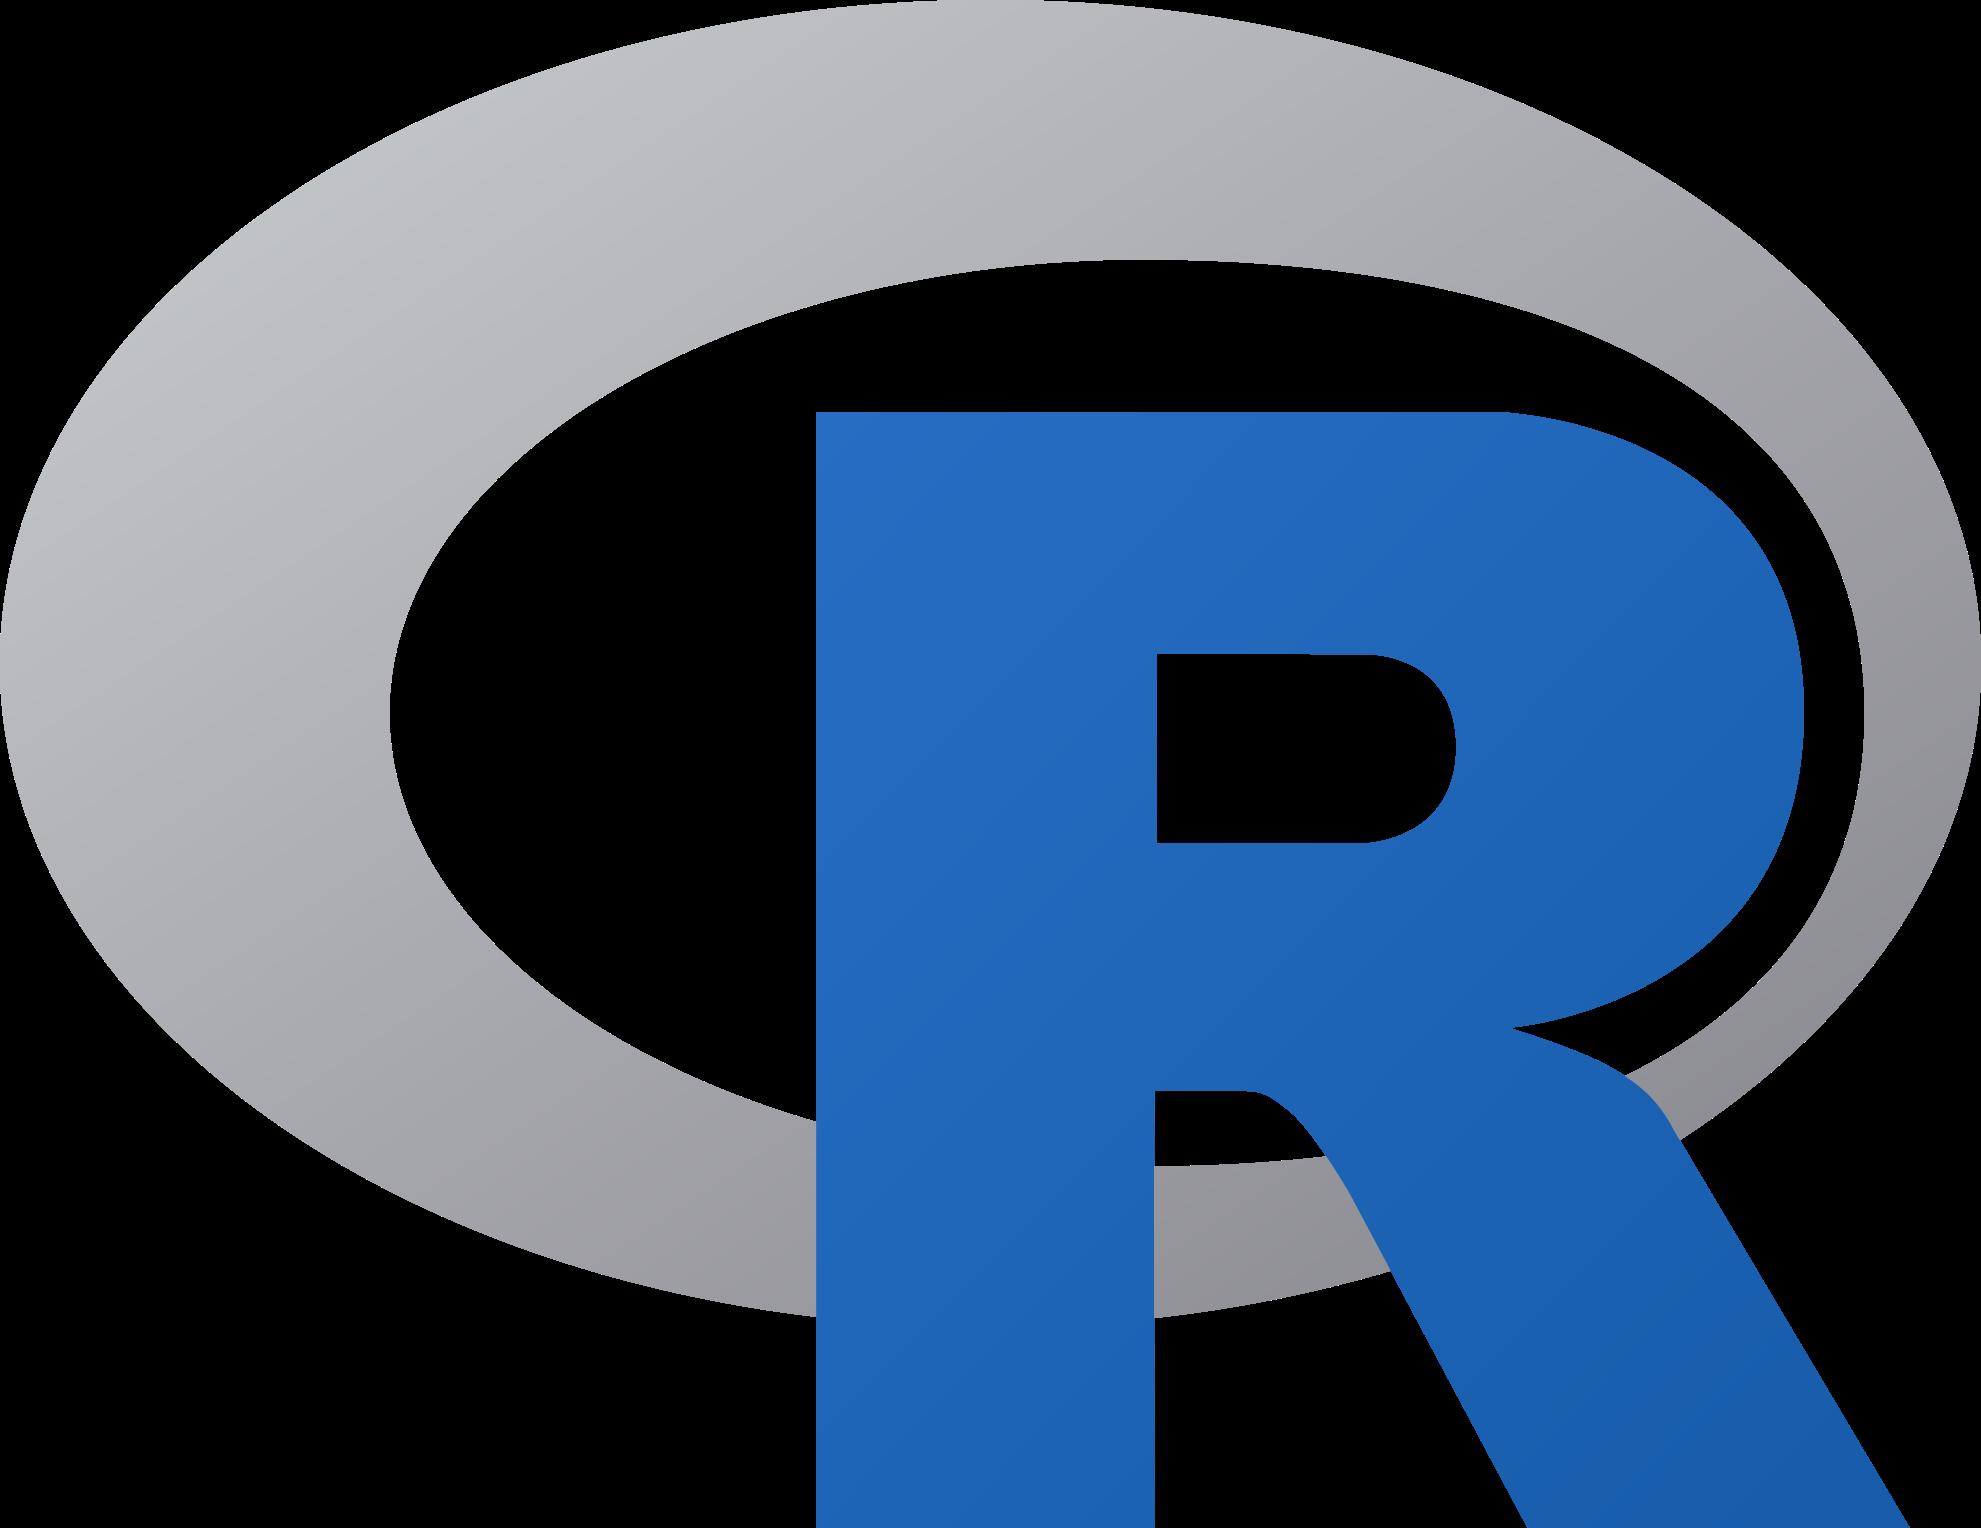 R Reaches Its Personal Maximum In The TIOBE Index